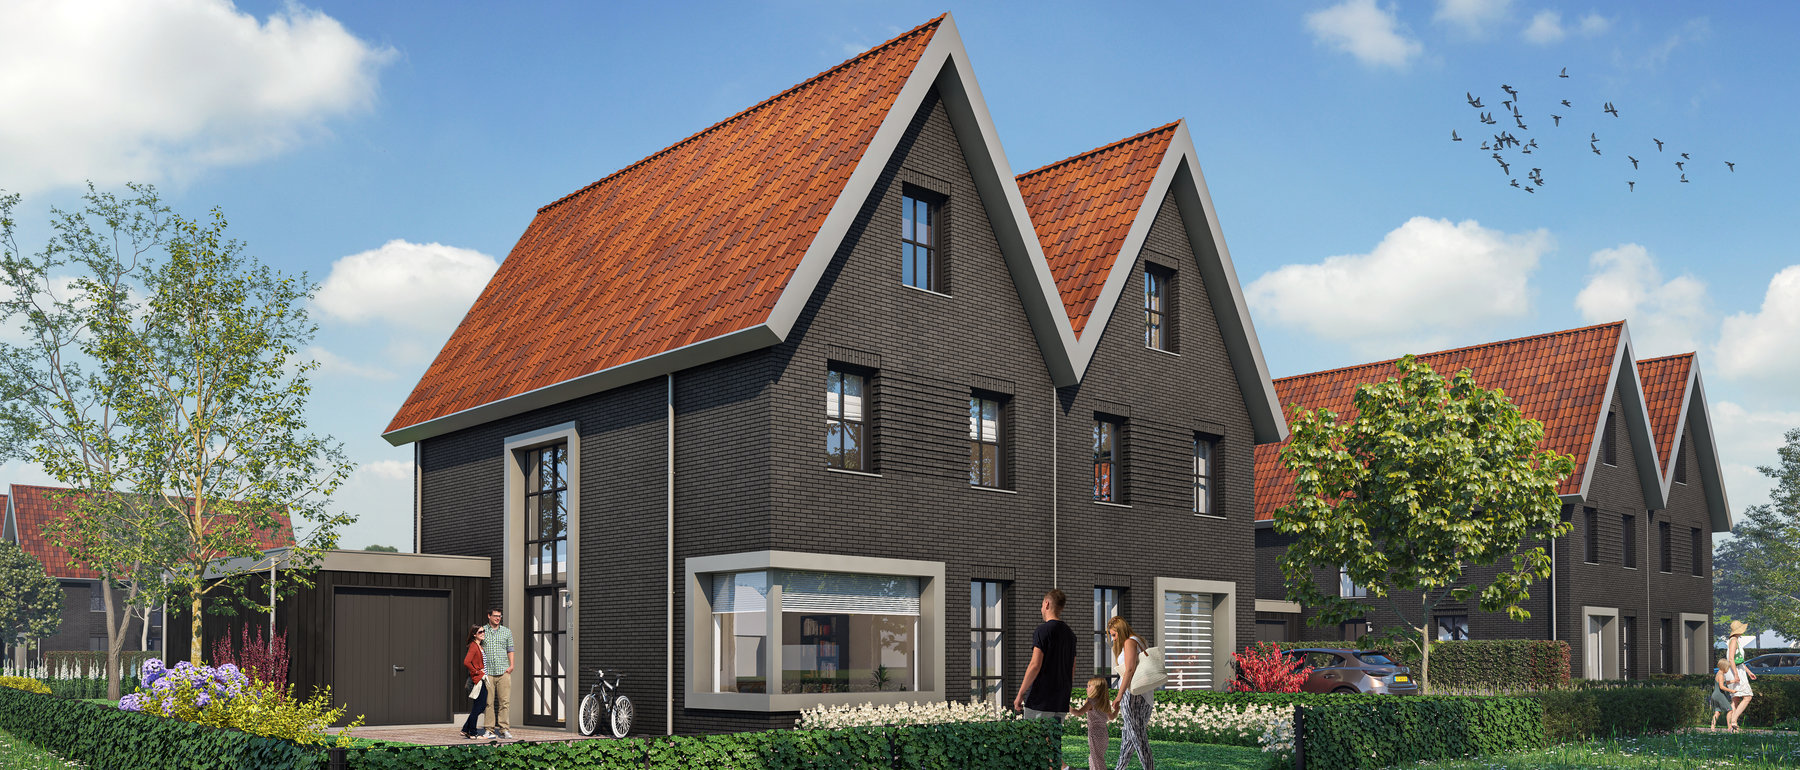 Stadsdock Dokkum | Bouwer: Hekstra